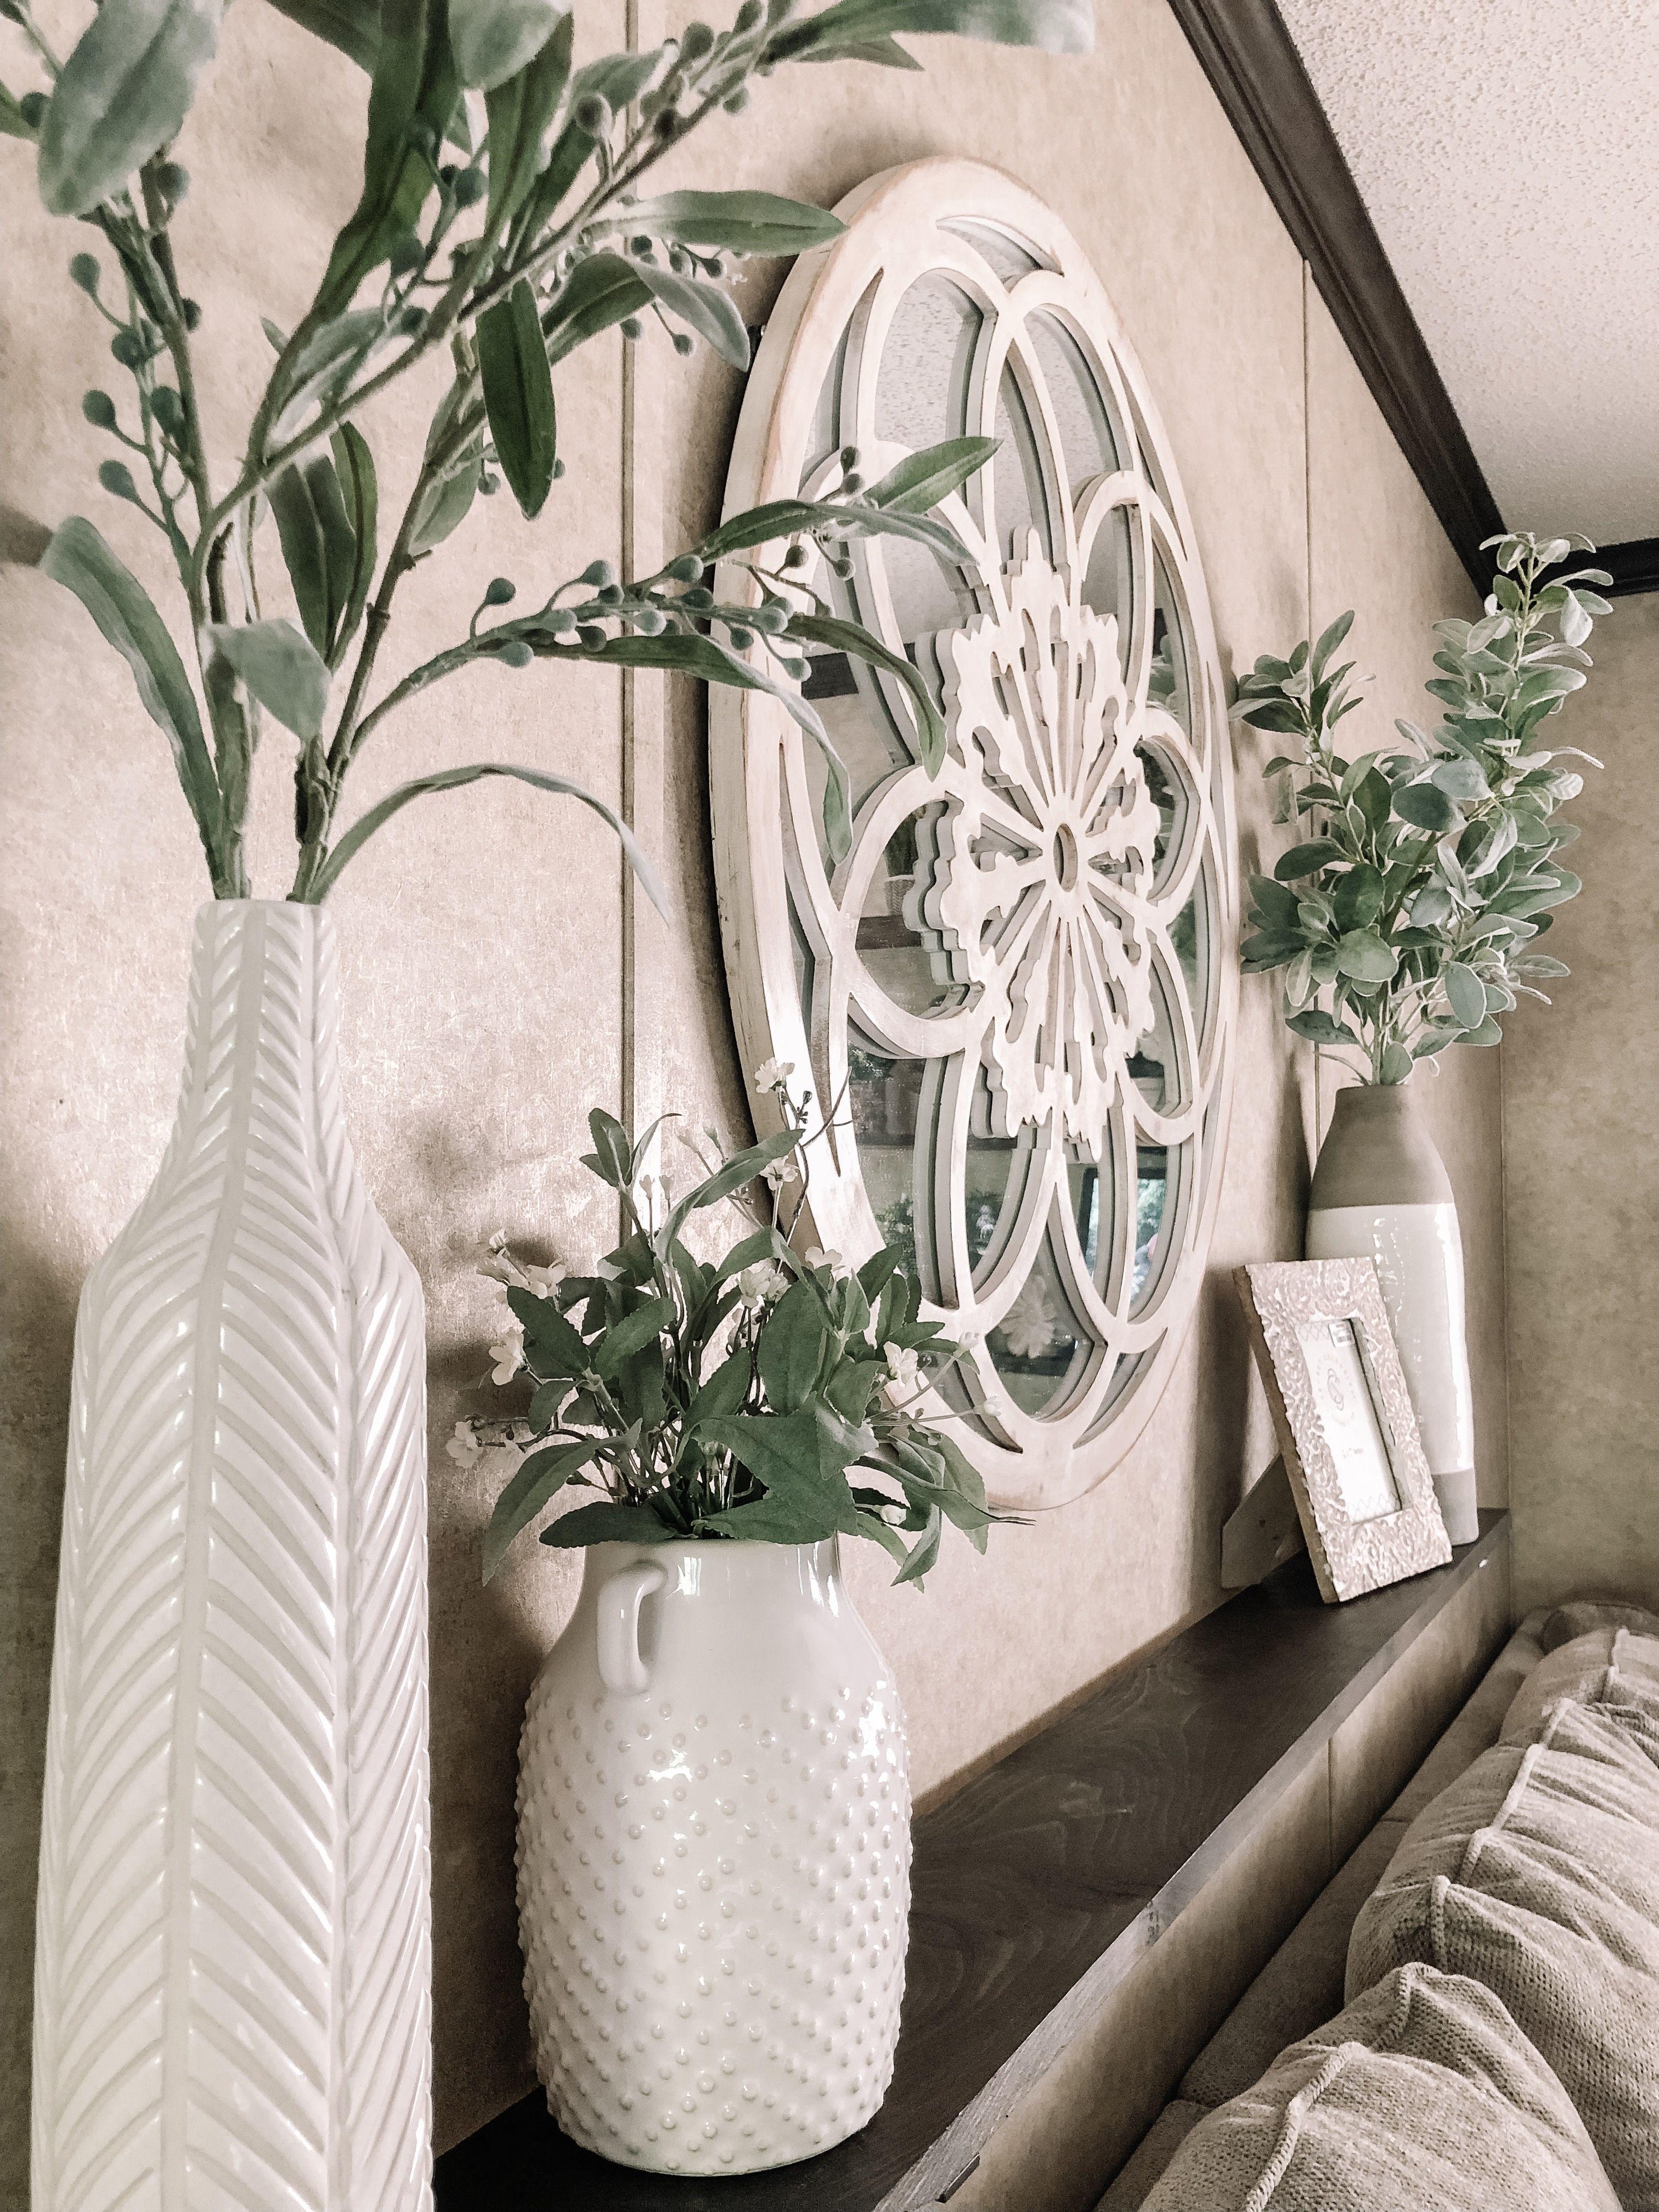 Living room wall shelf. DIY faux floating shelf | Wall ...